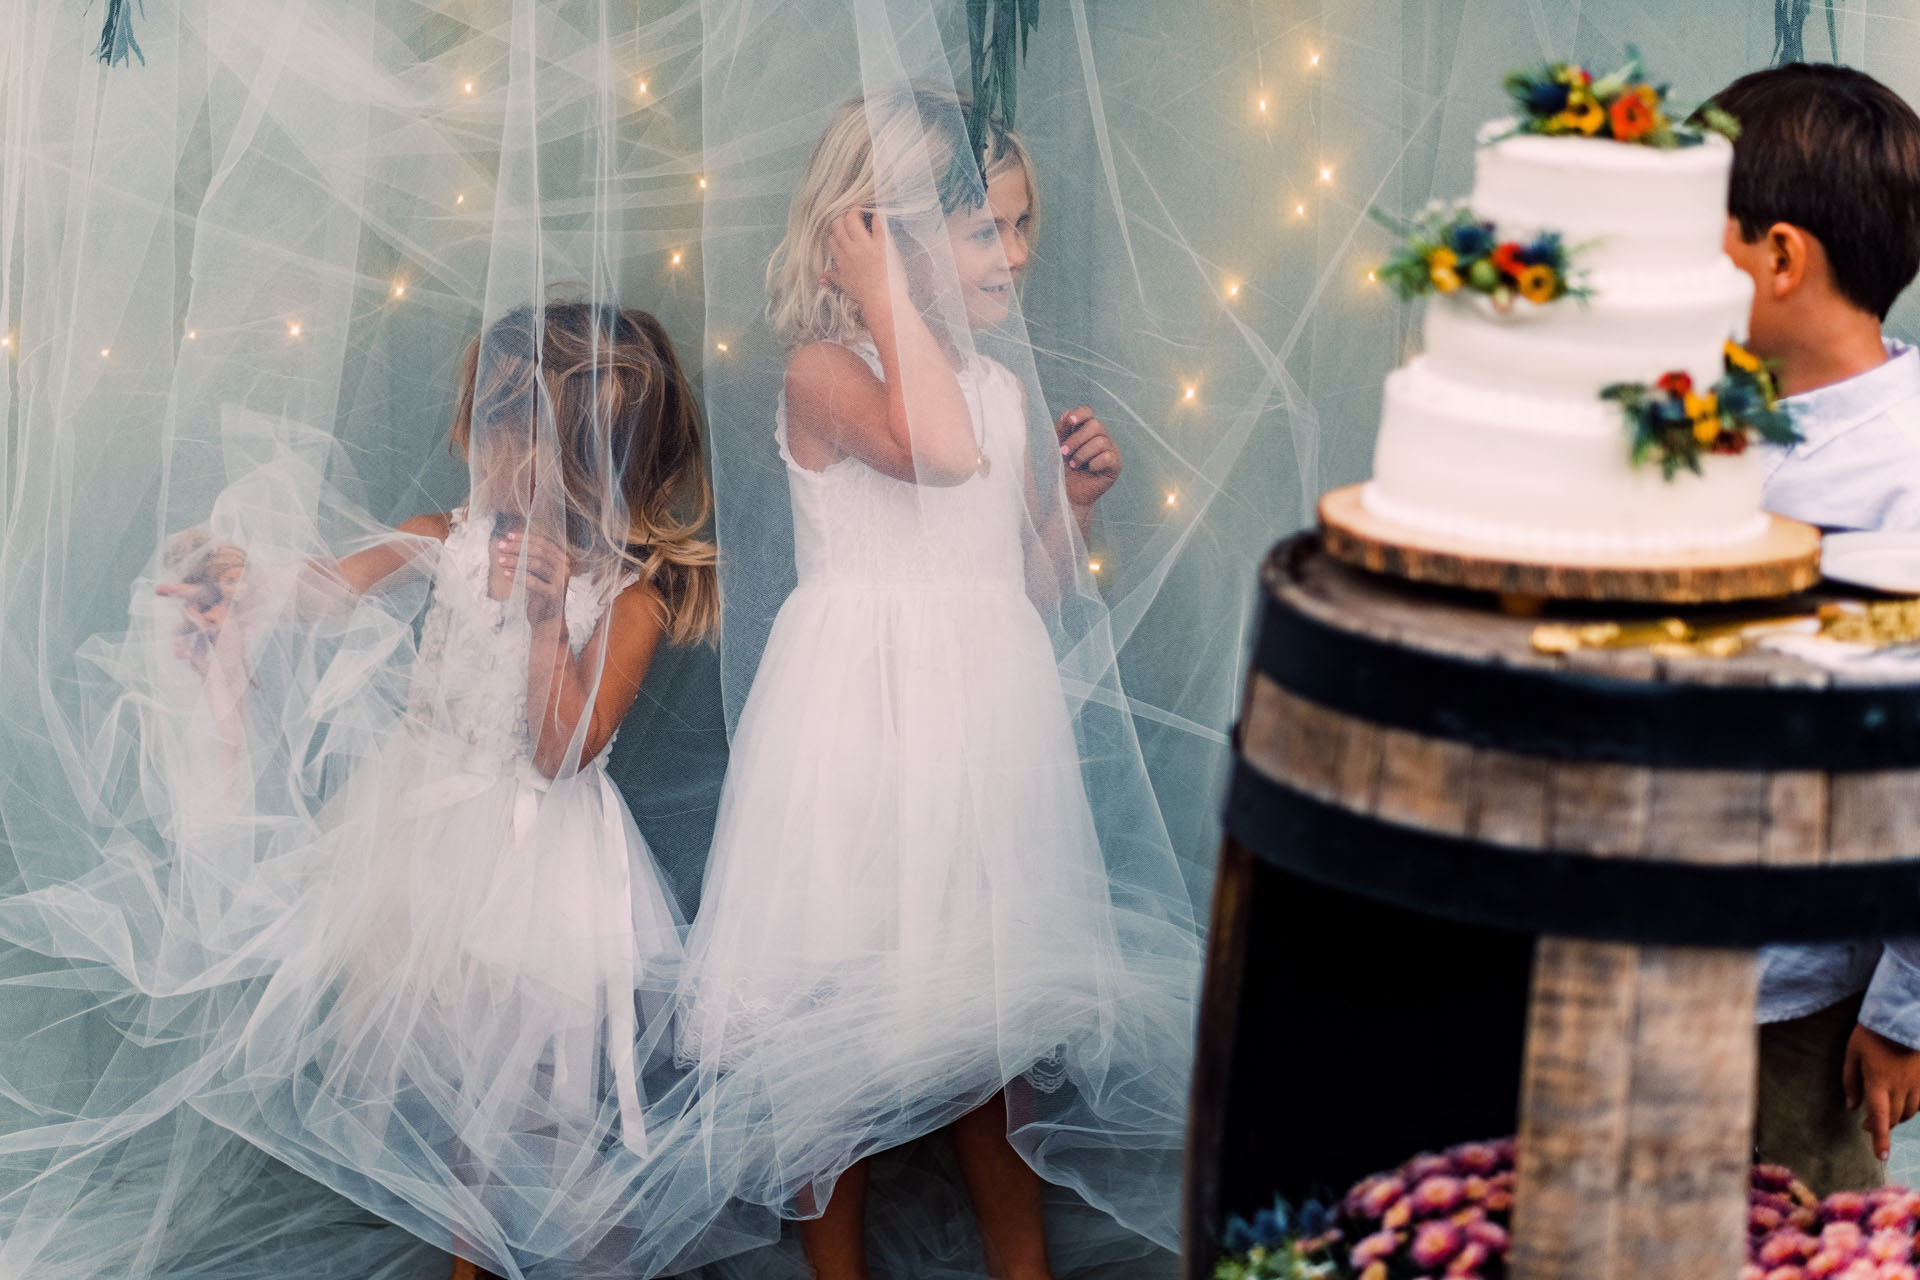 10-7-17 Devon and Jordan's Wedding-205.jpg